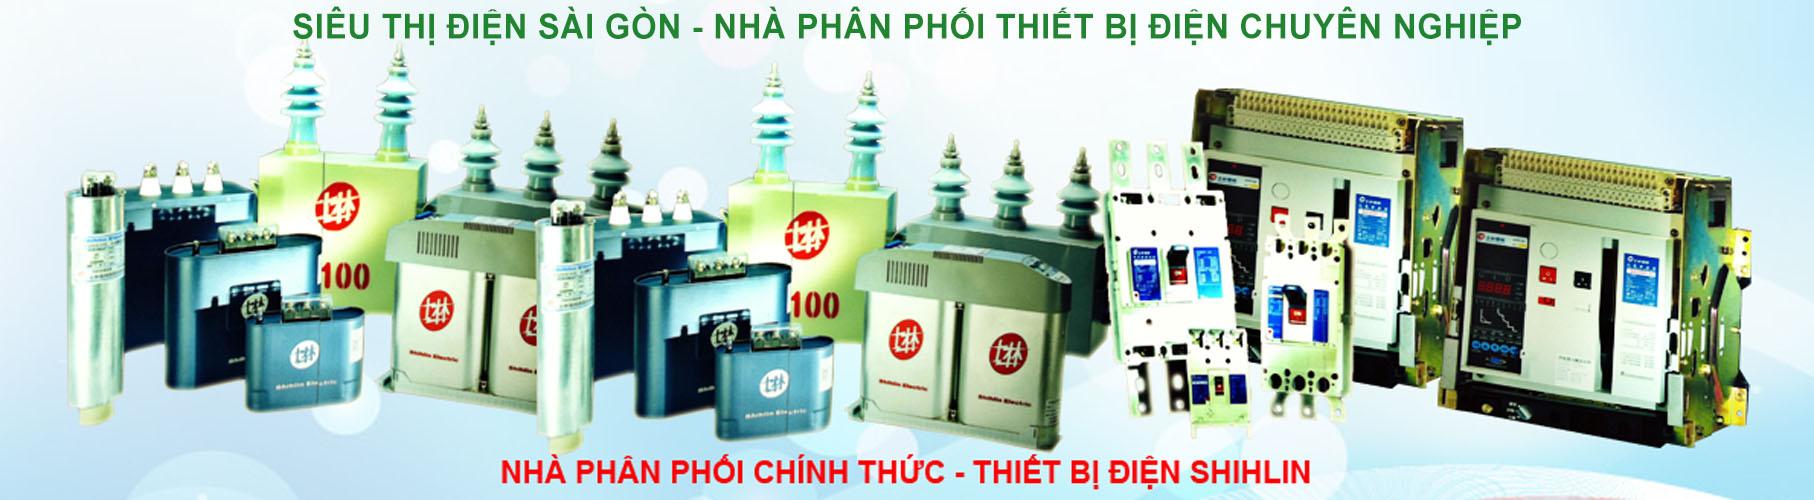 Home page banner - Shihlin